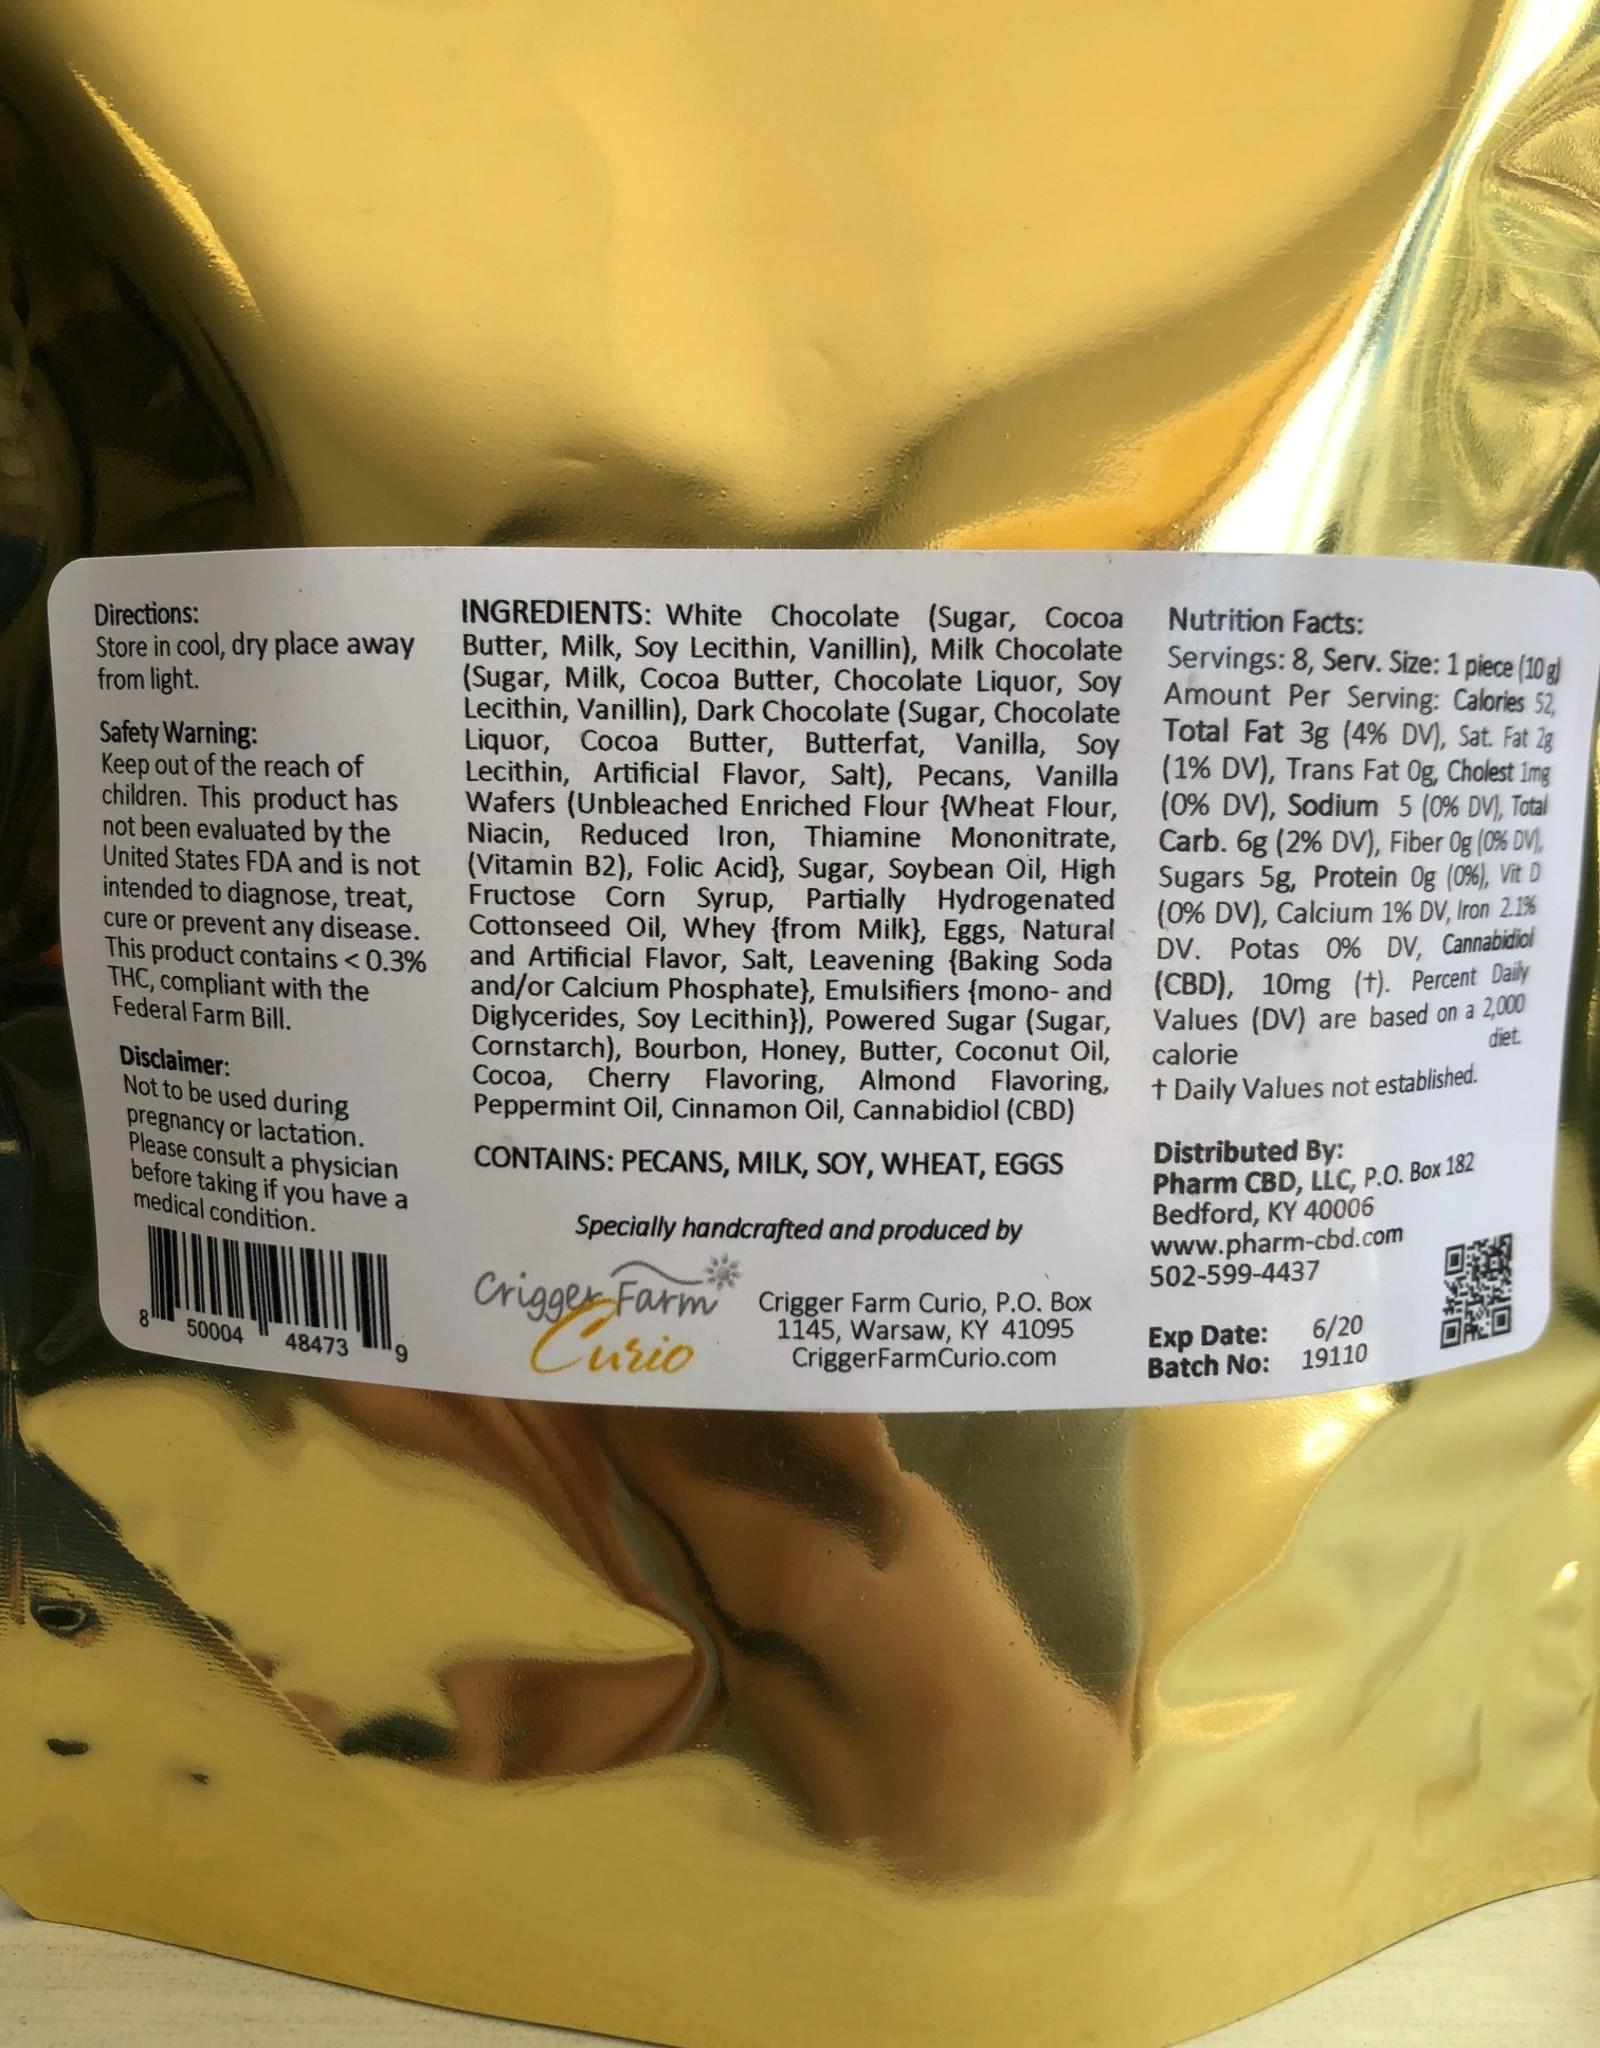 Pharm CBD CBD Truffles – 8 Pack